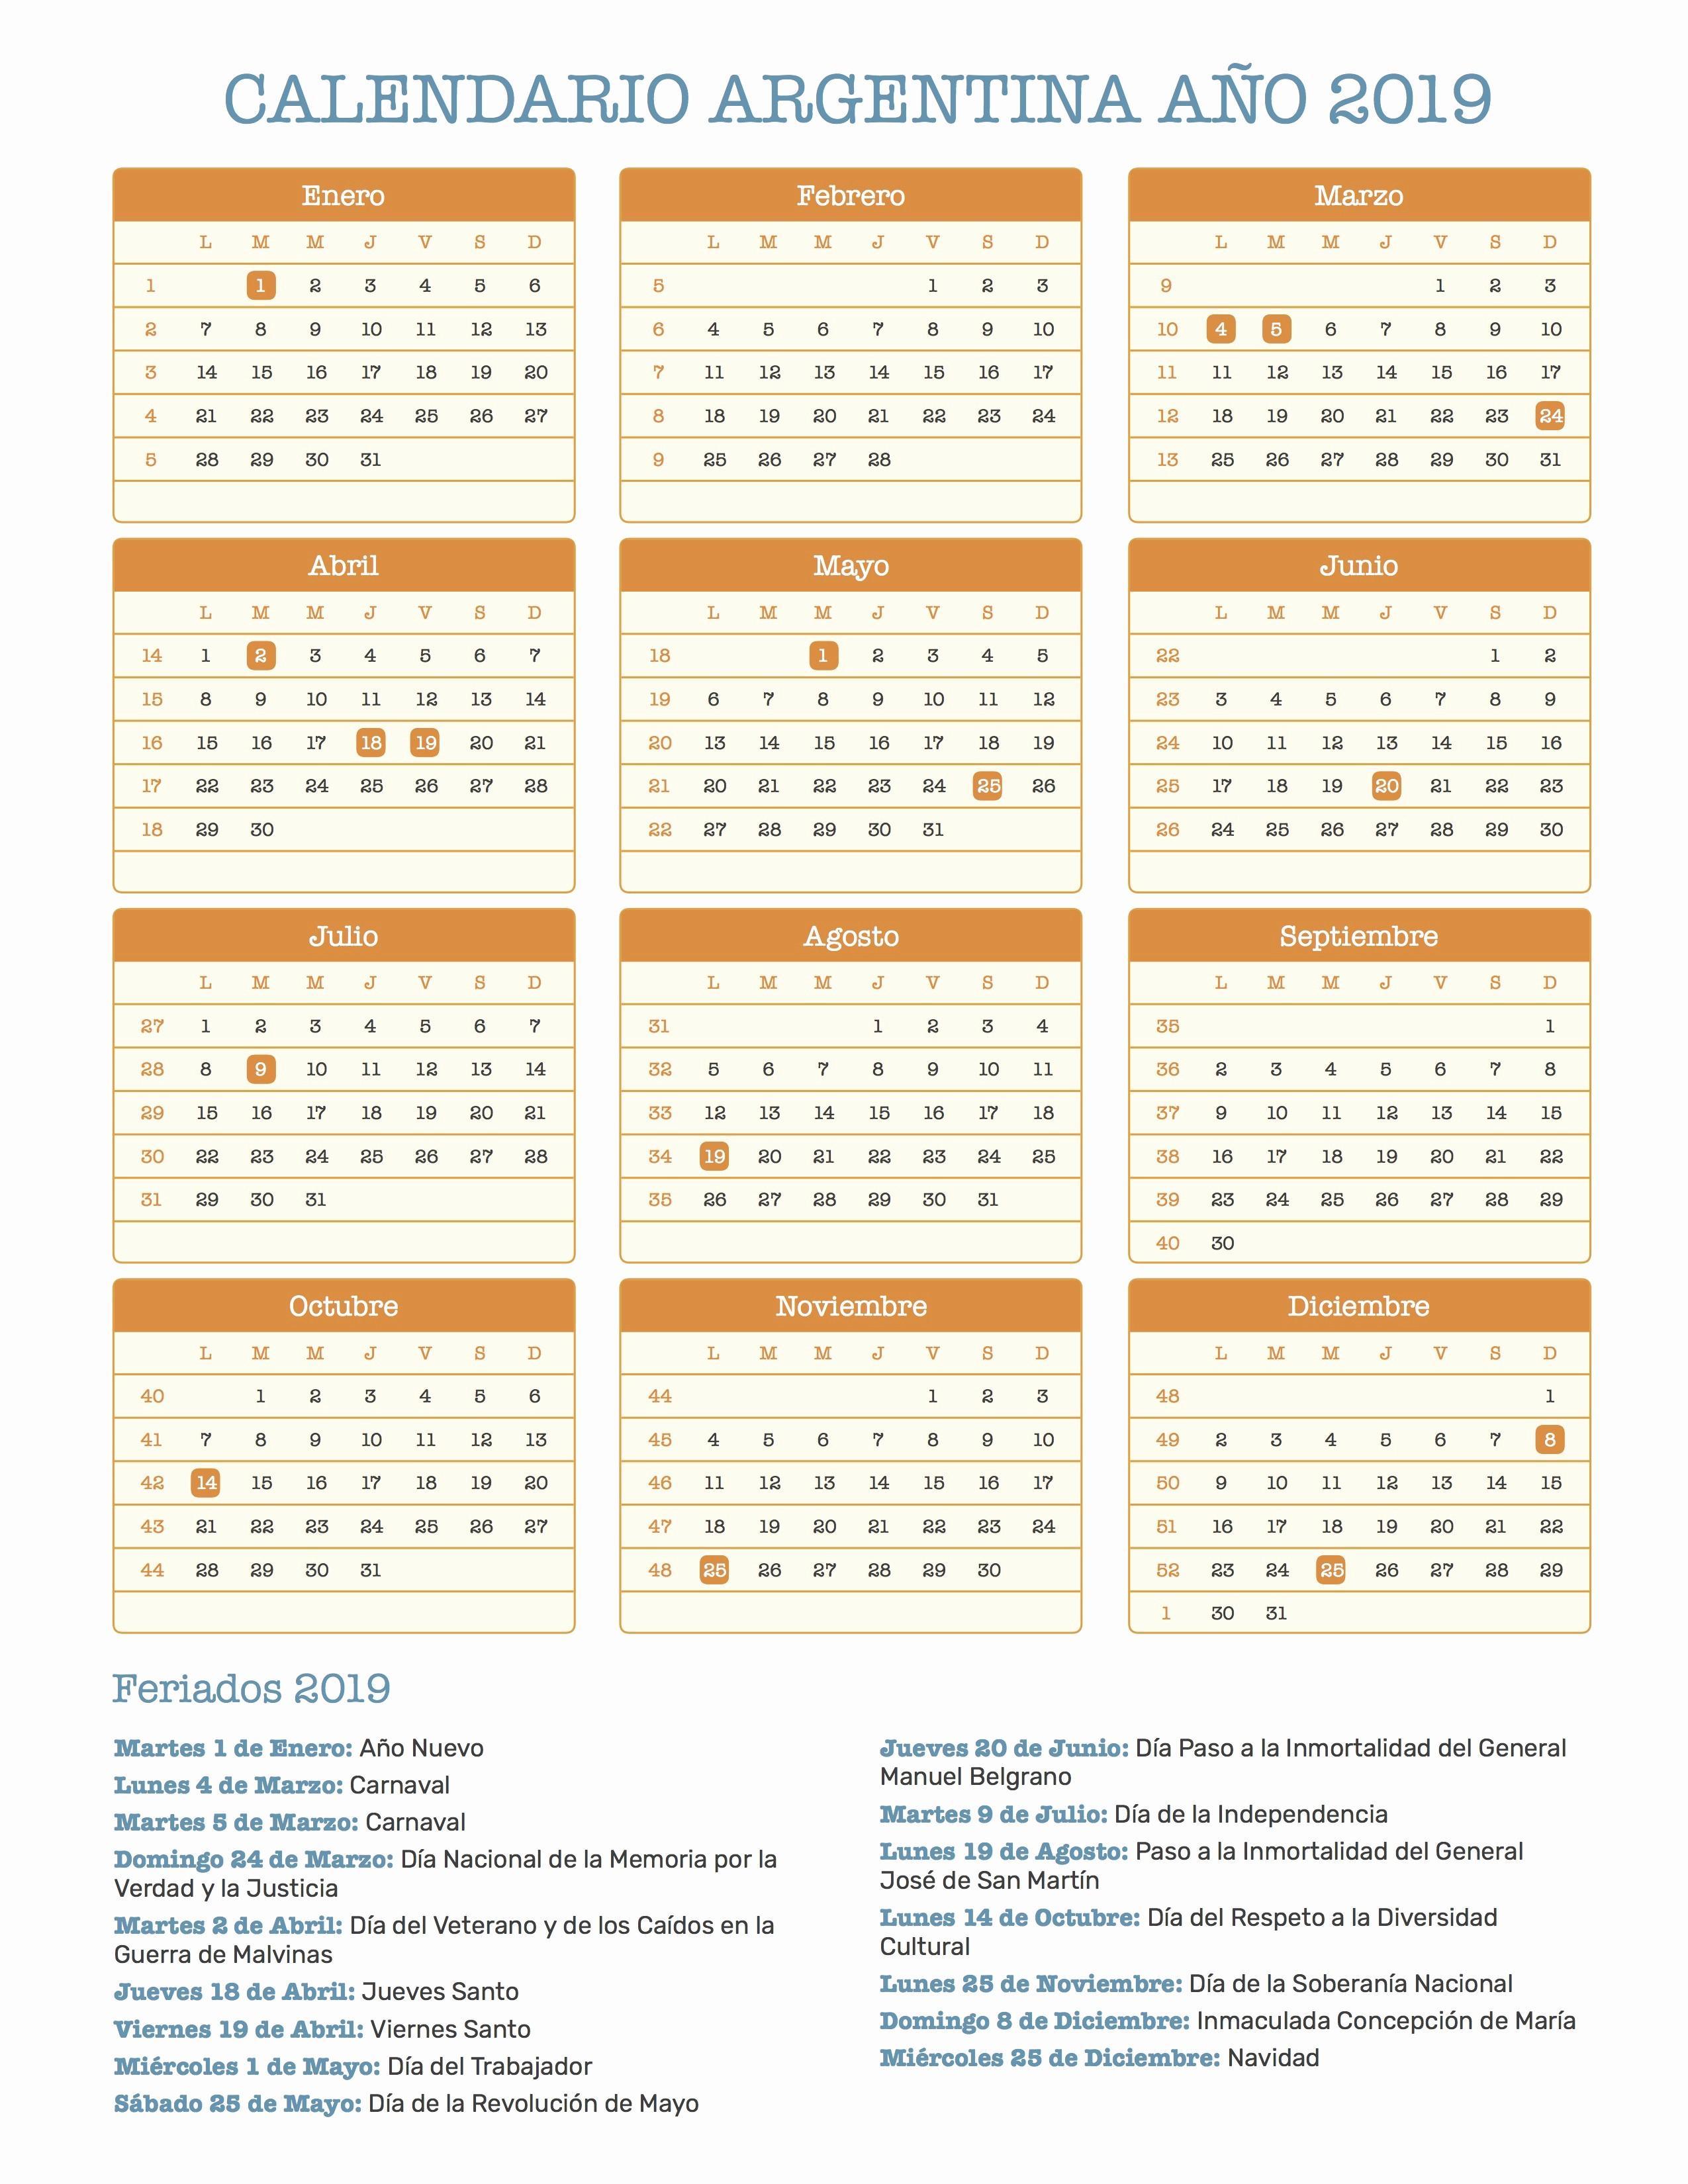 Calendario Dias Festivos Madrid 2019 Actual Calendario Dr 2019 Calendario Argentina Ano 2019 Feriados Of Calendario Dias Festivos Madrid 2019 Más Actual Institucional Archivos Web Municipal Blanca Murcia Ayuntamiento